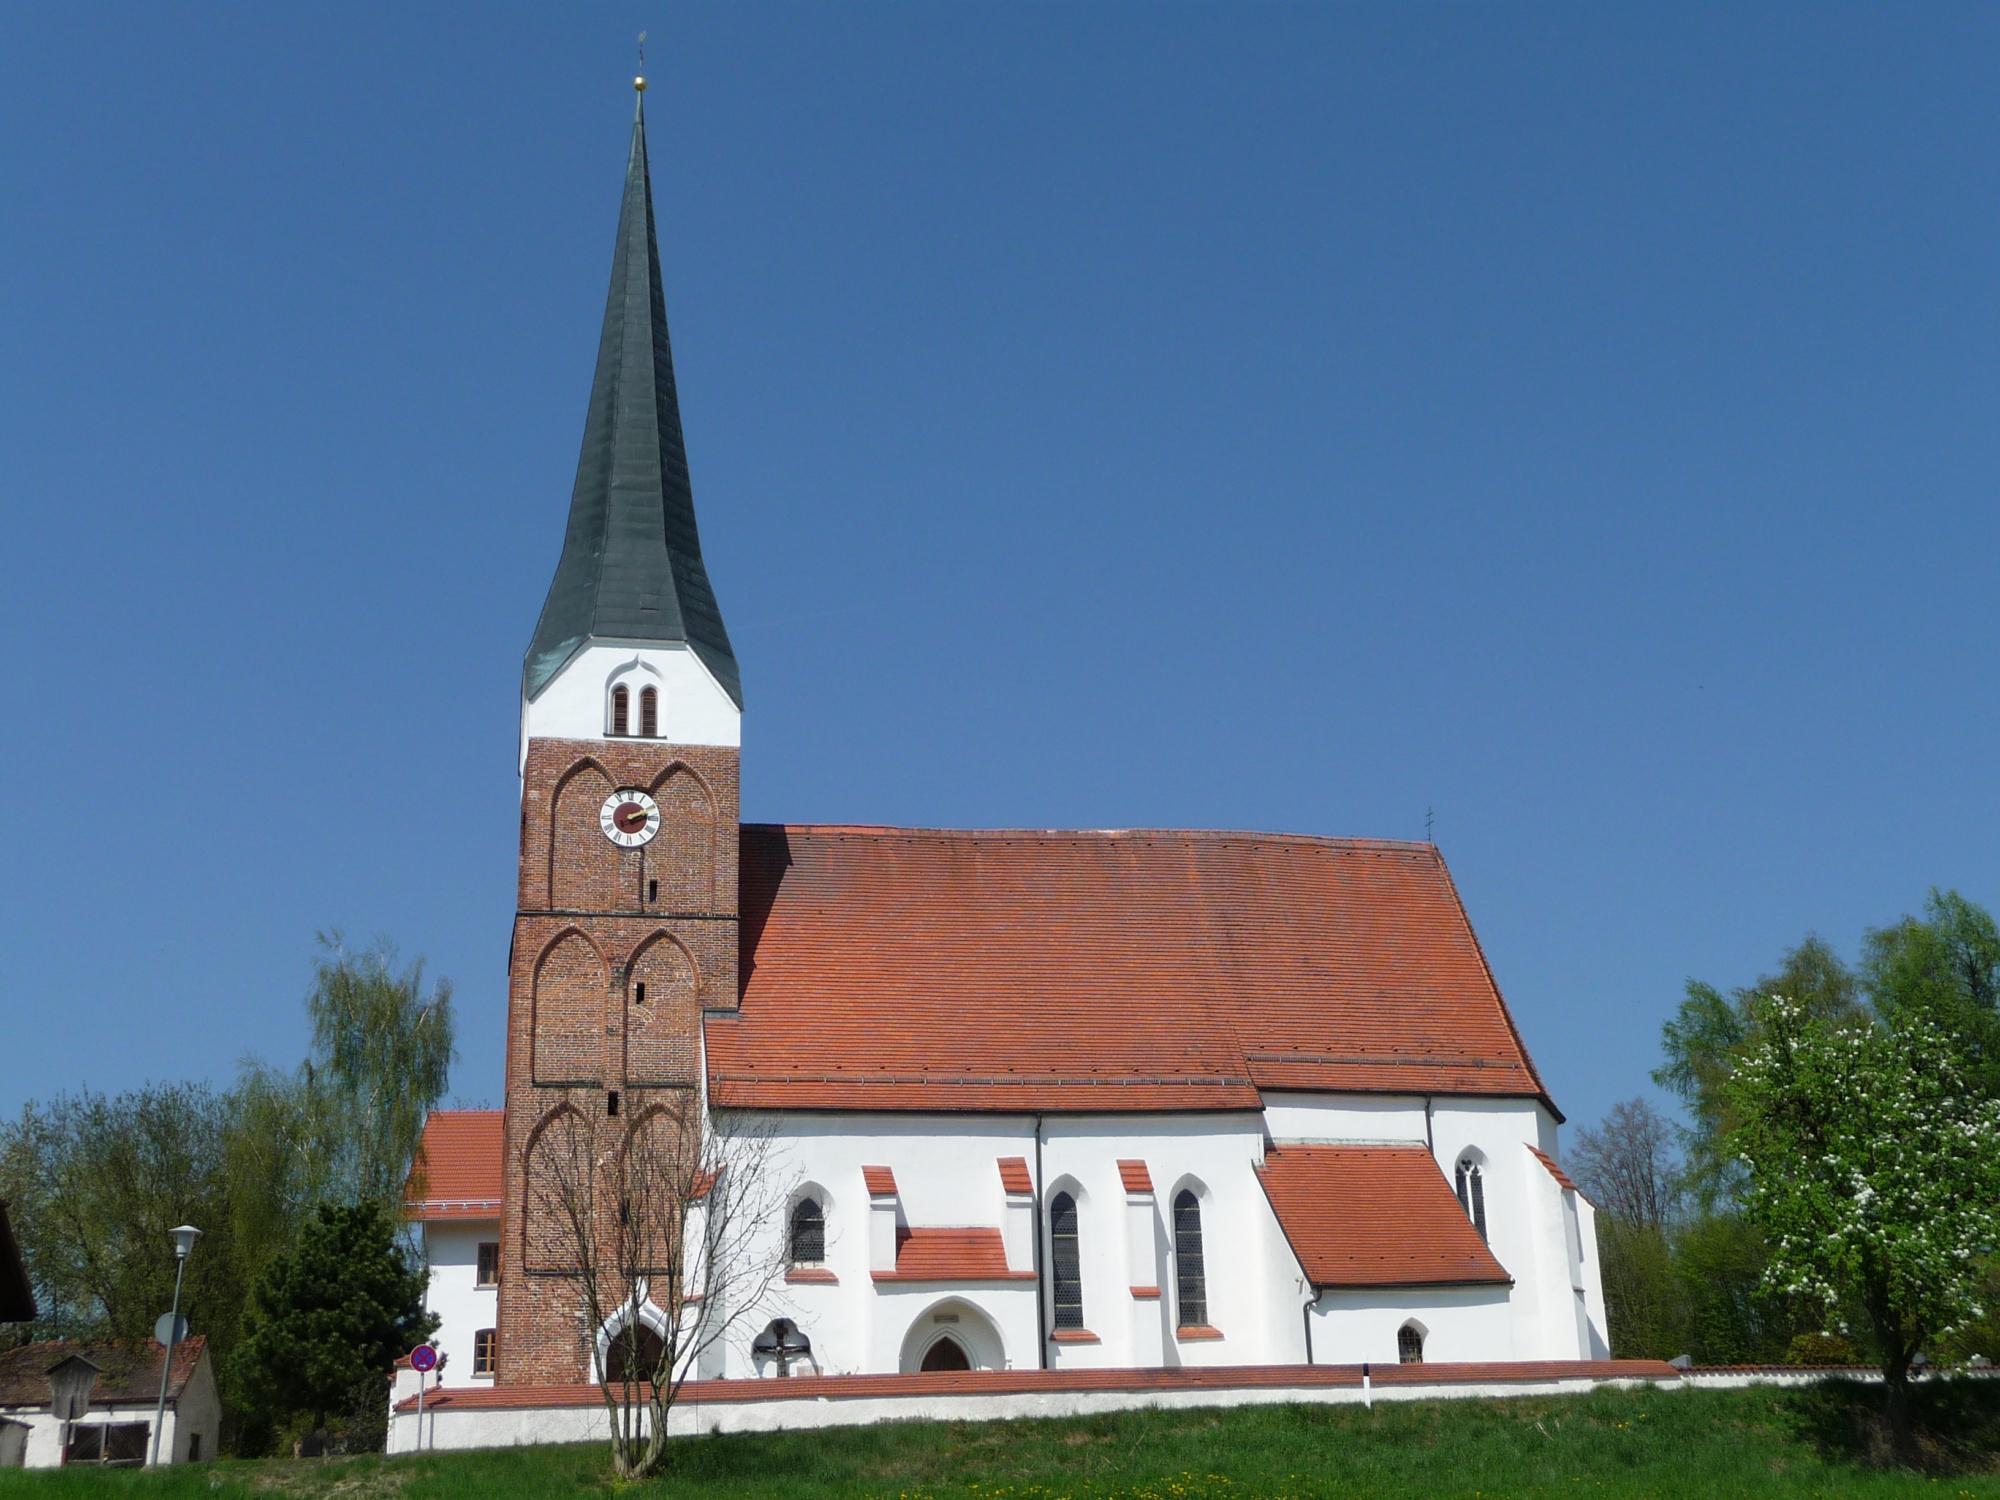 Pfarrkirche Wolfakirchen